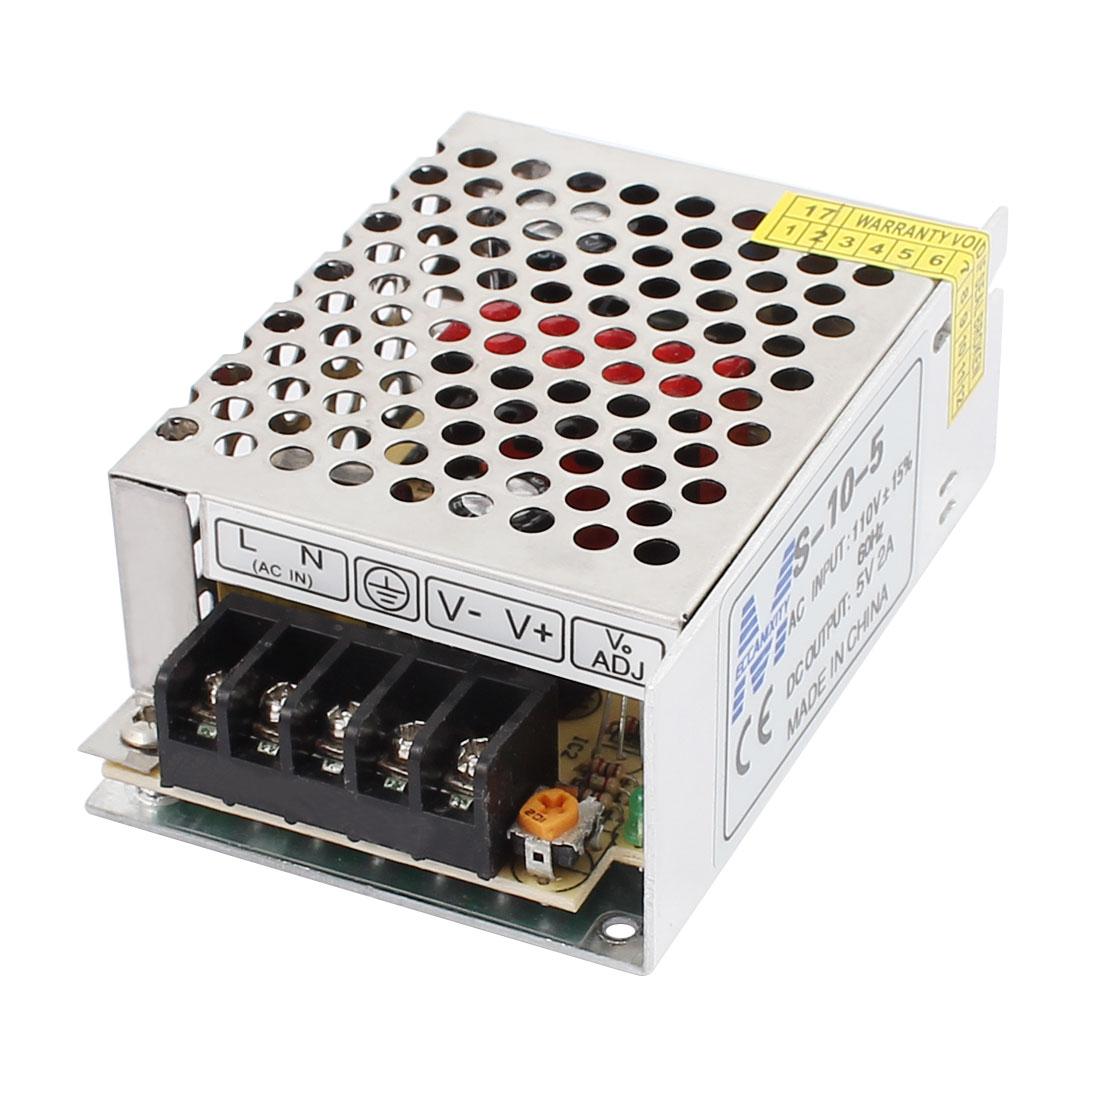 Switch Power Supply Driver for LED Strip Light AC 110/220V 5V 2A 10W